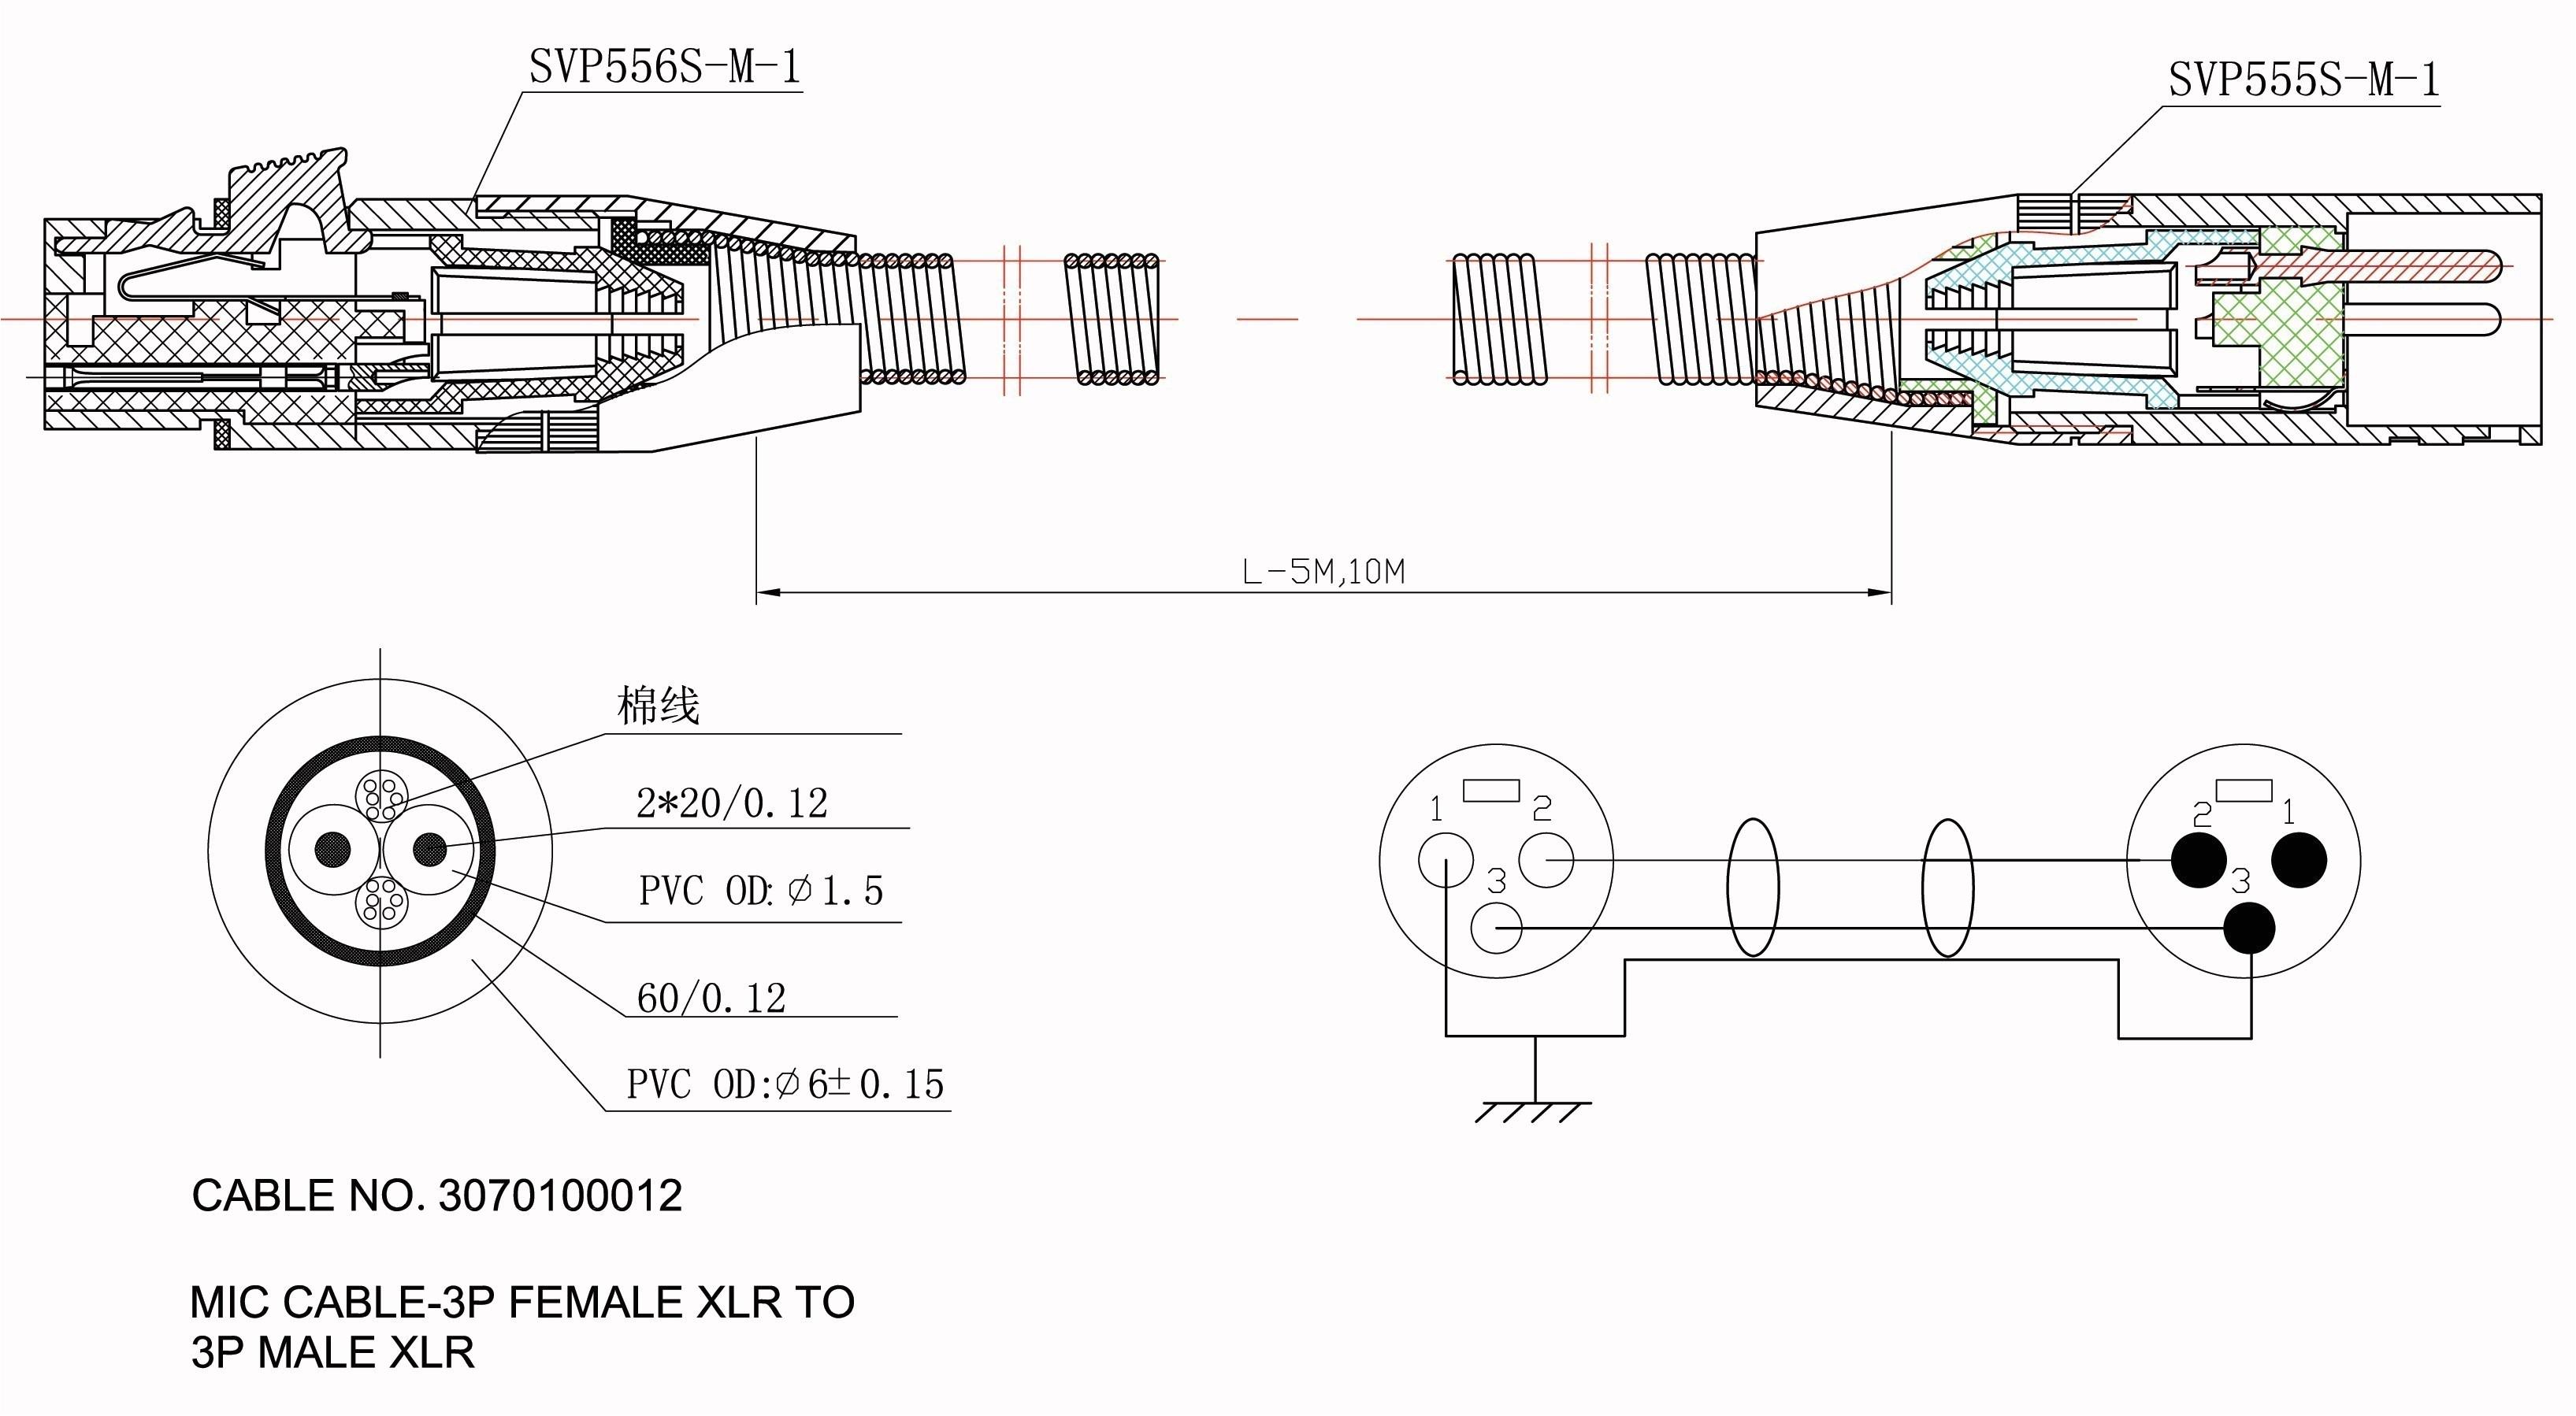 m1010 wiring diagrams